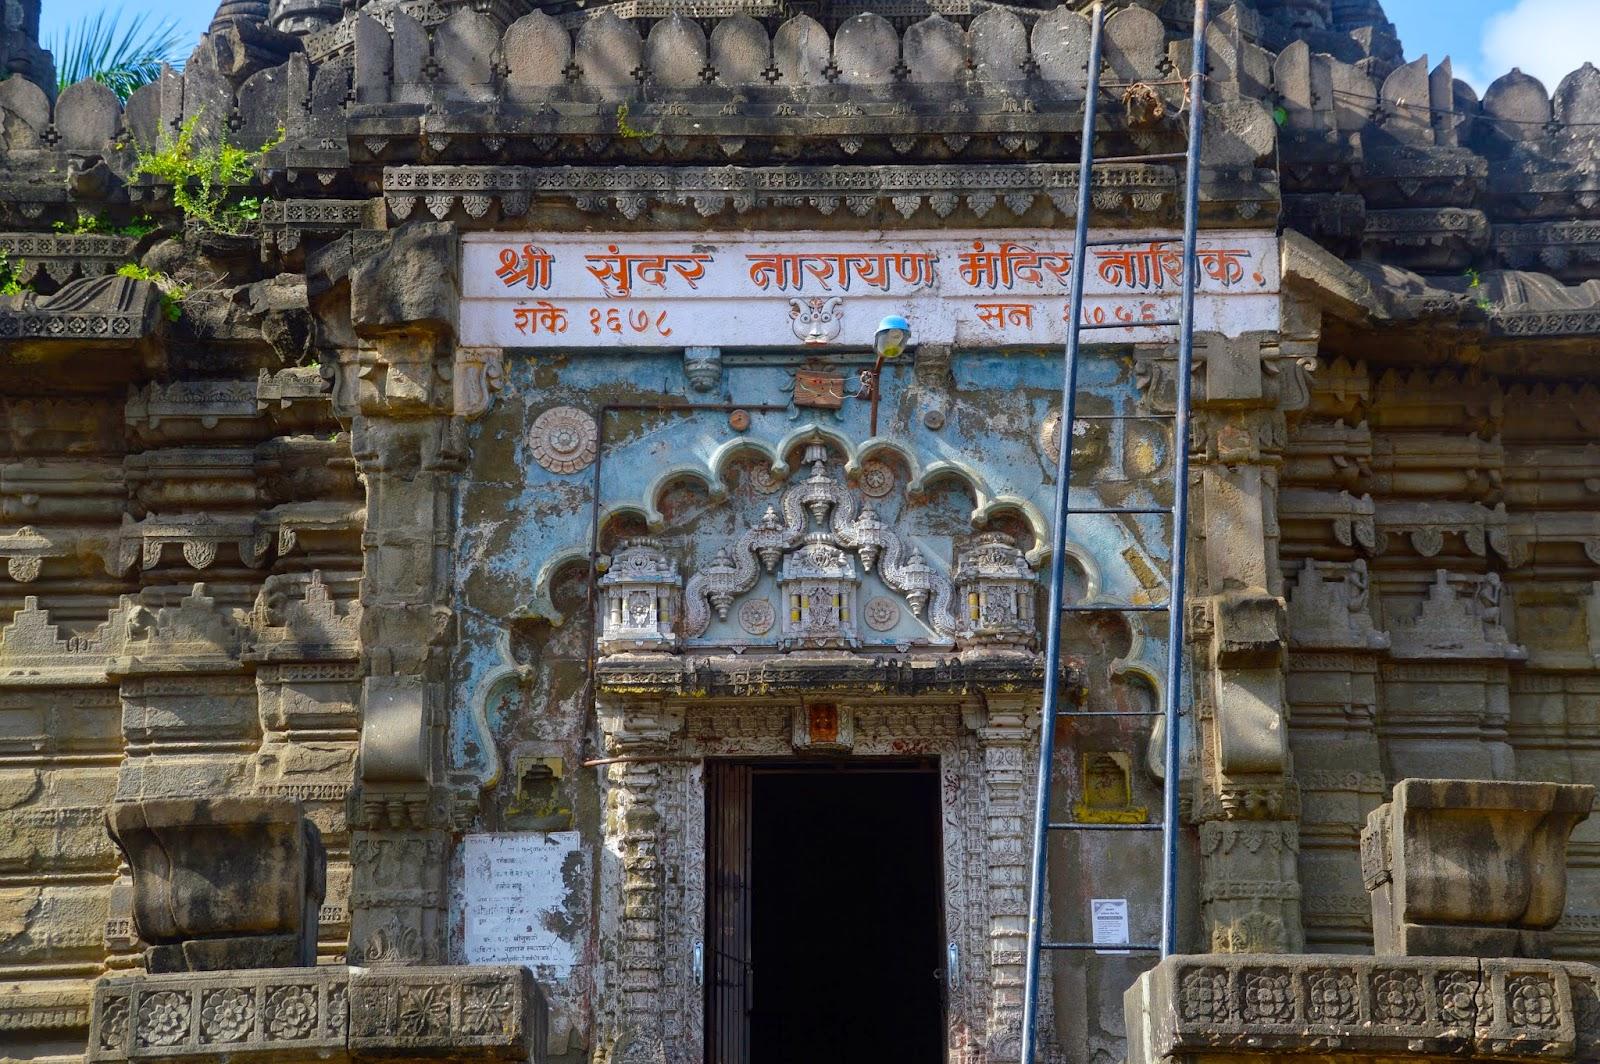 Beautiful pictures of gods and their temple - Nashik Temples Sundarnarayan Maharashtra Travel Tourism Religion Hindu